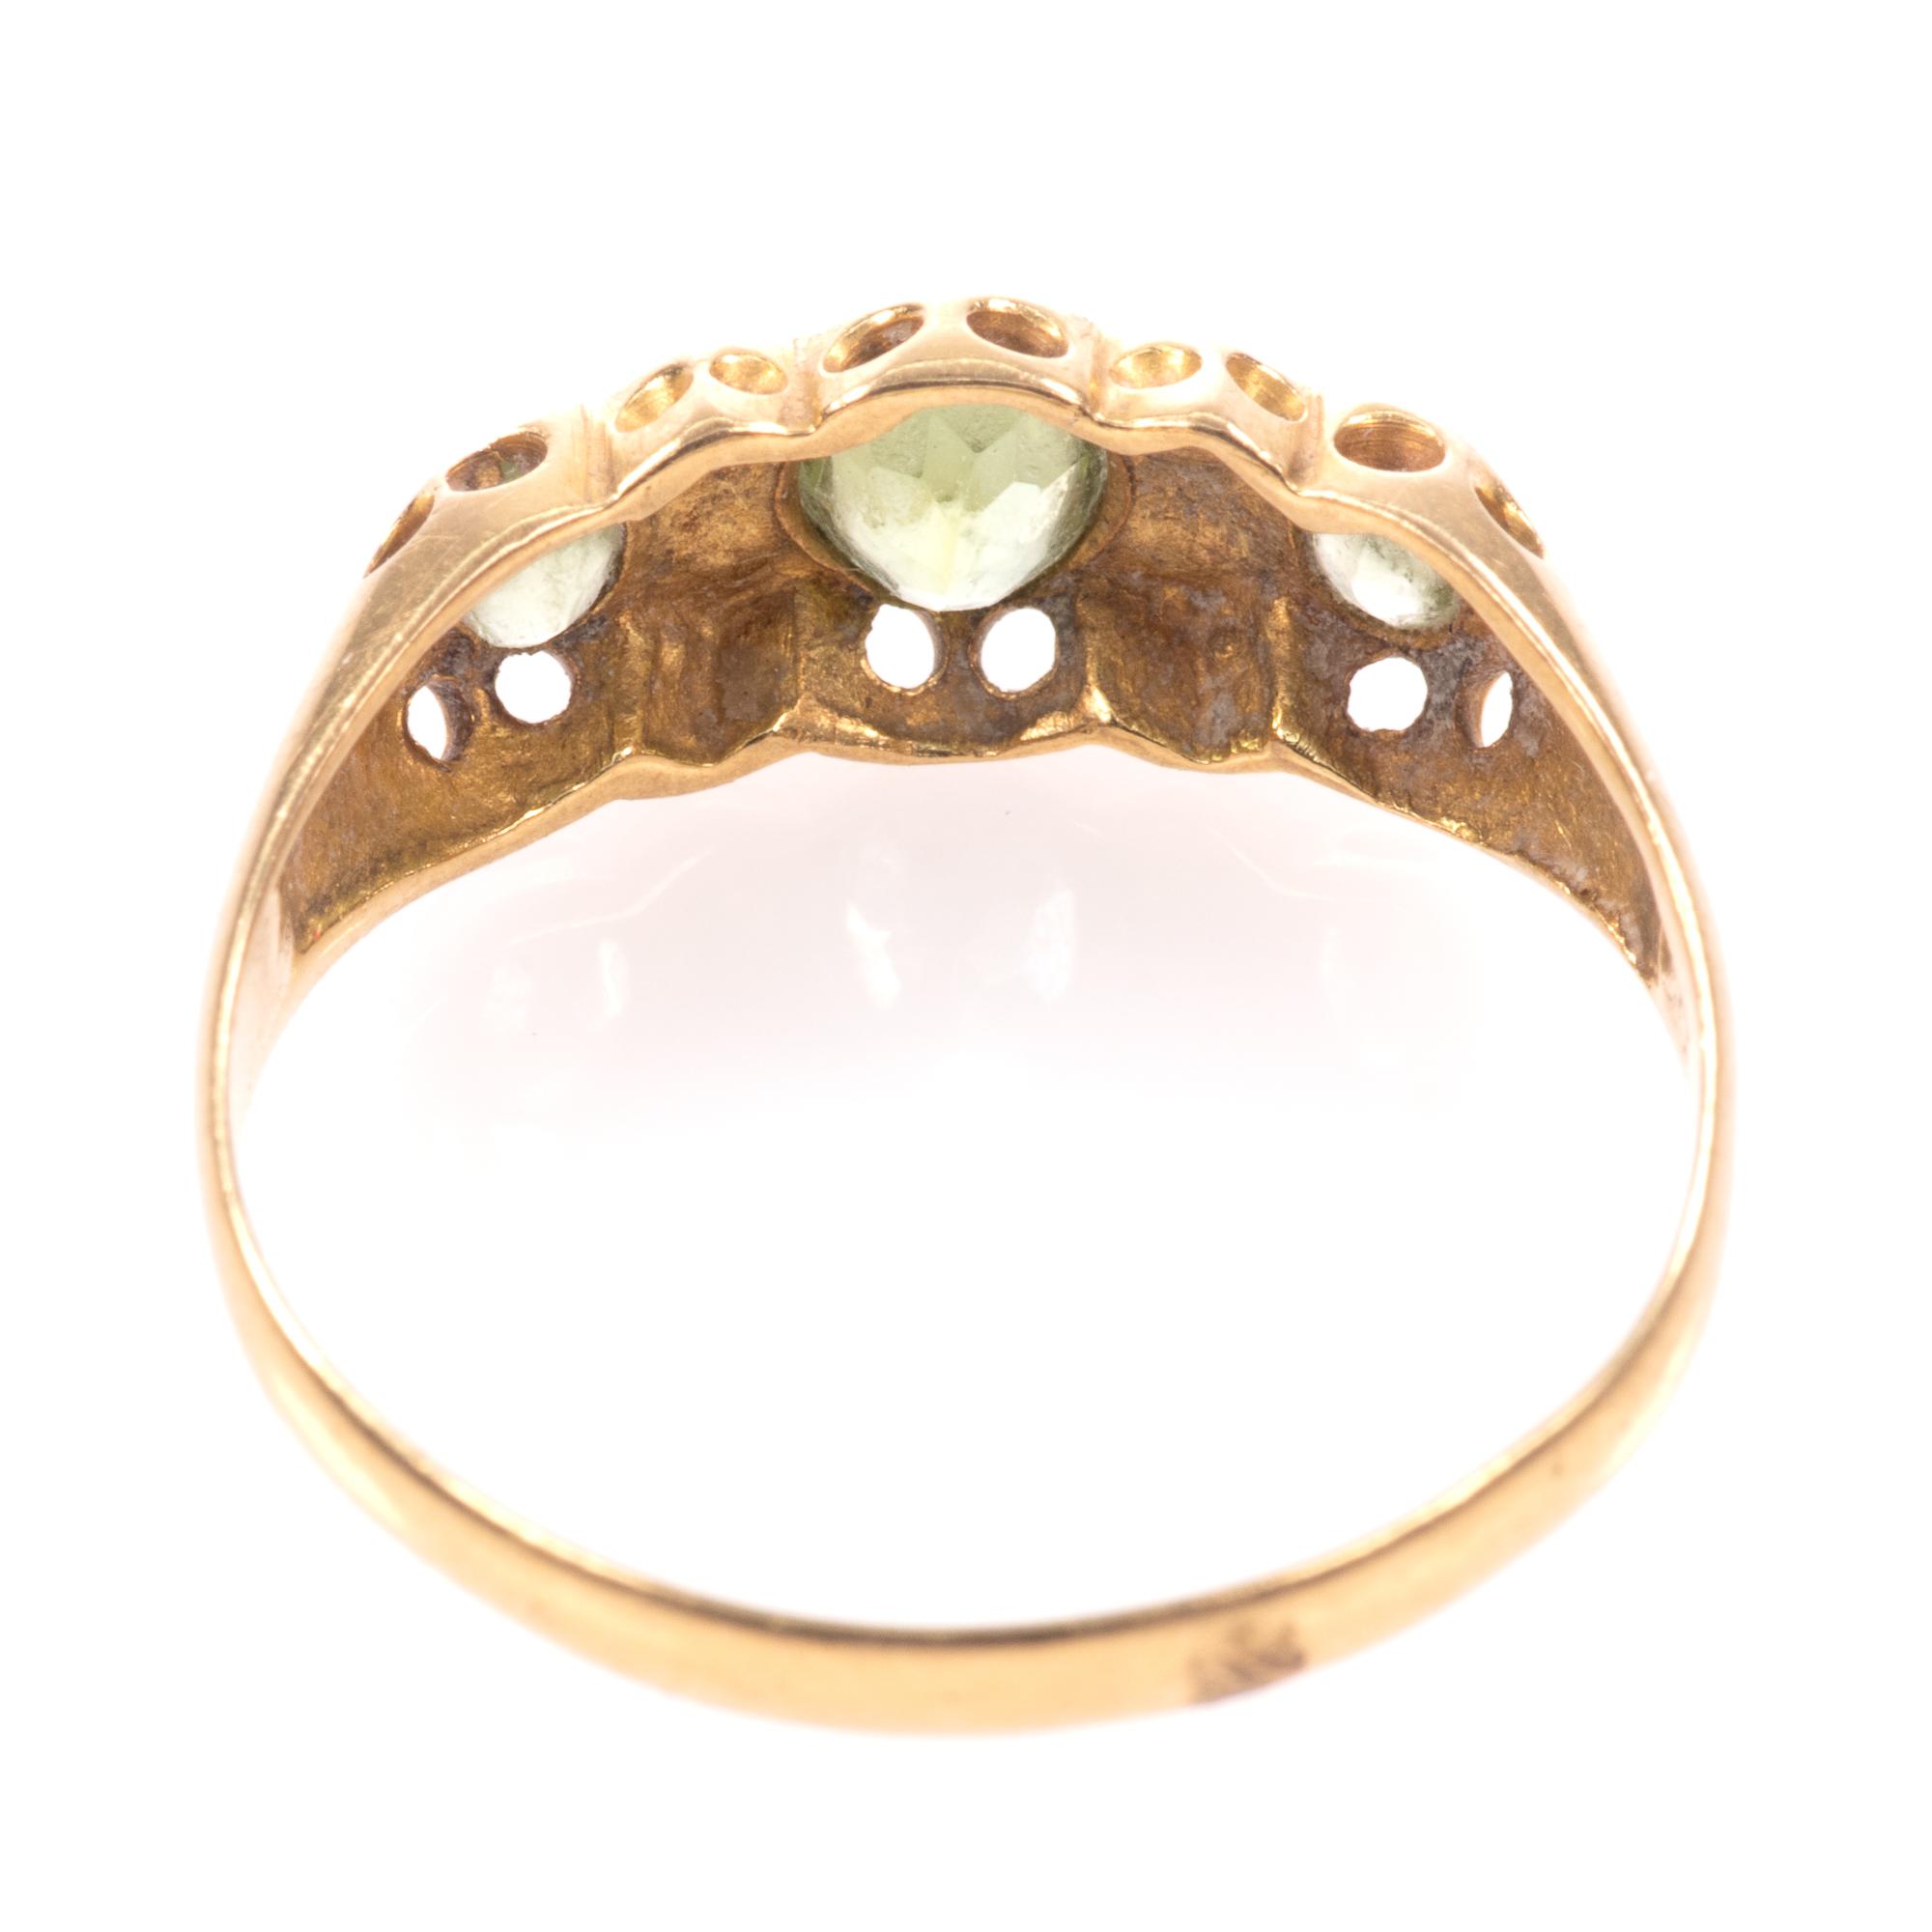 18ct Gold 0.90ct Peridot & Diamond Ring Chester 1918 - Image 7 of 8